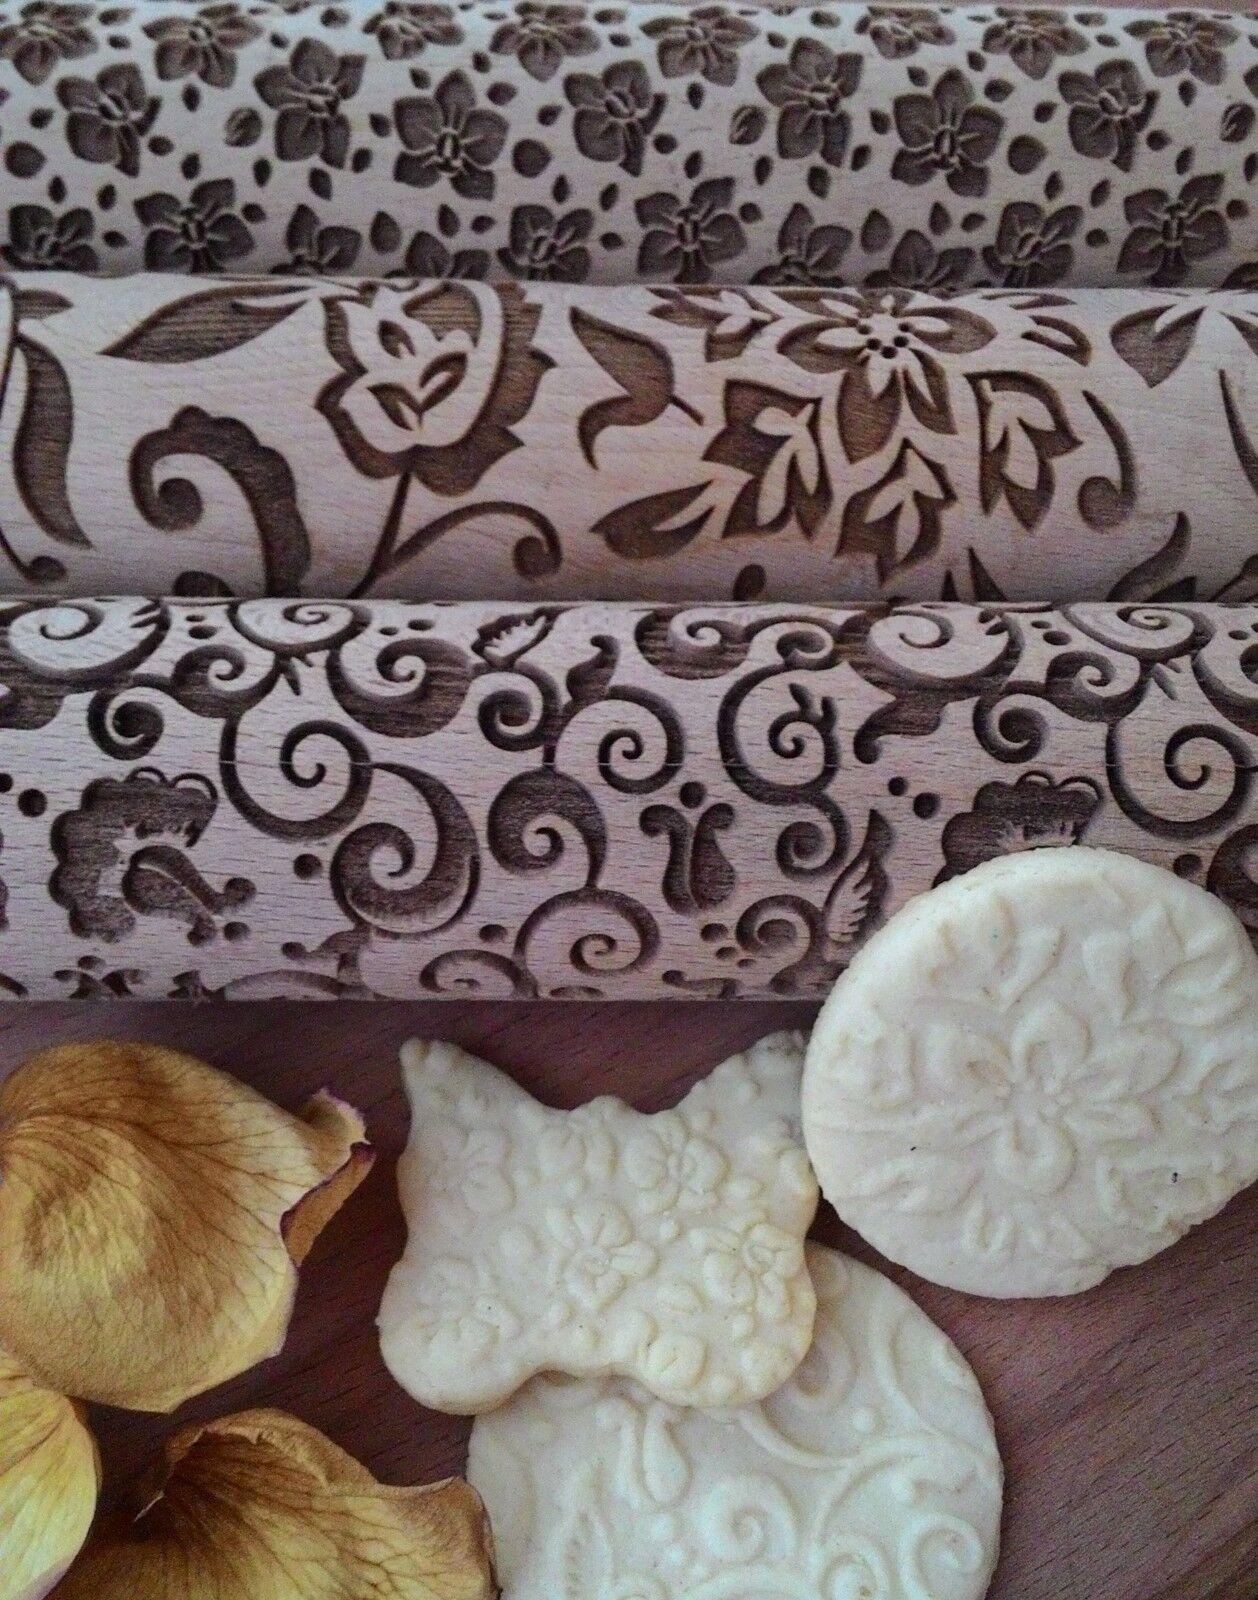 Wooden Rolling Pin Laser cut Natural Flowers Design pattern embossing Set 3 pcs